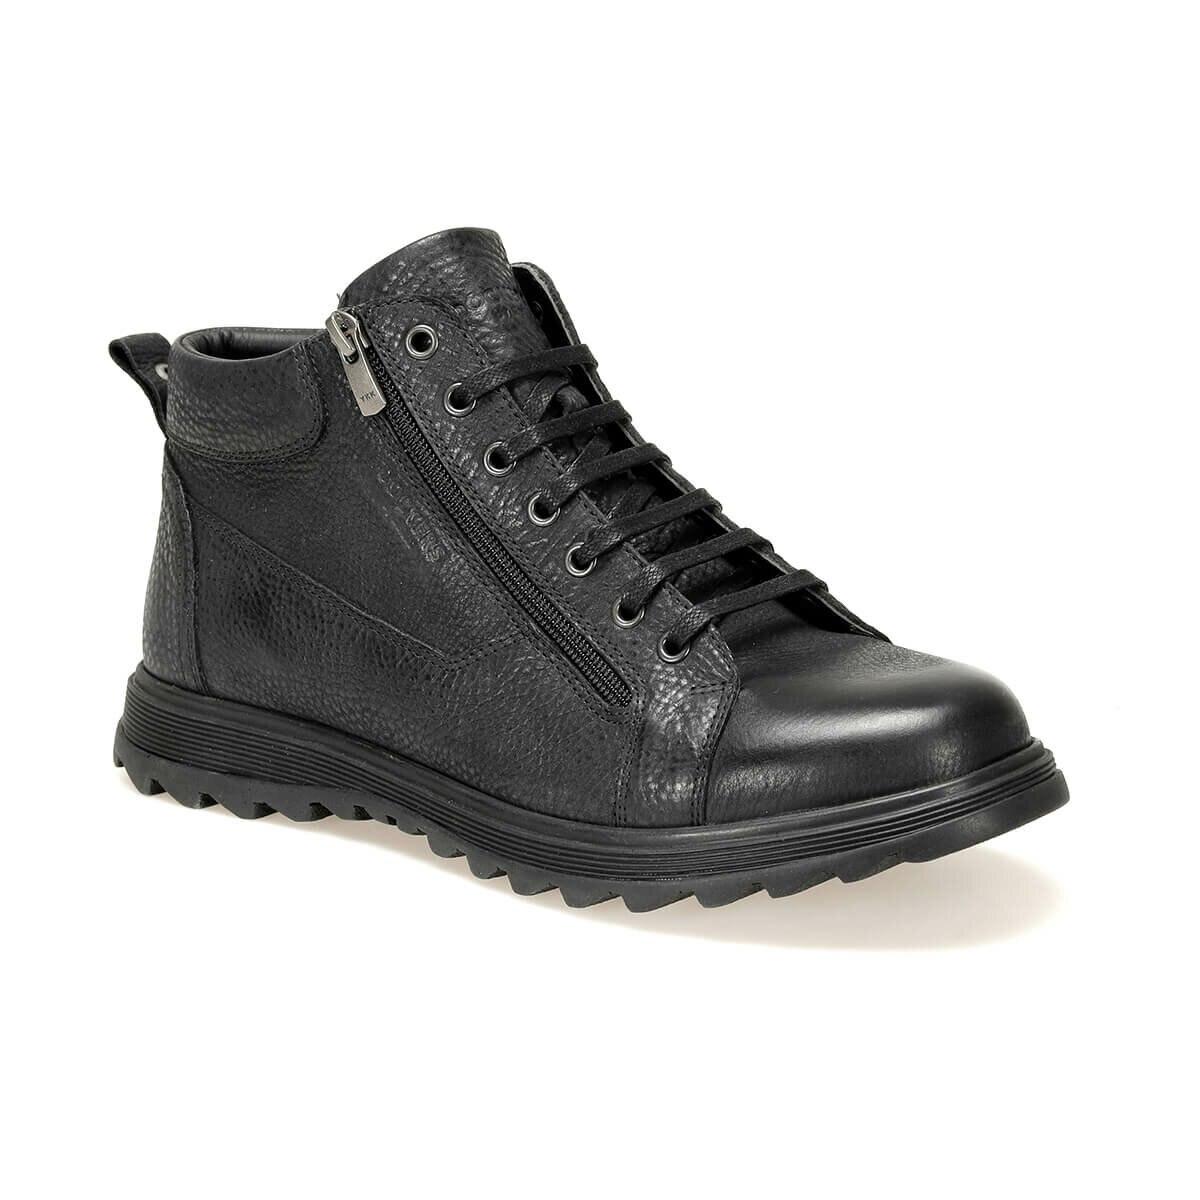 FLO 227145 9PR Black Men Boots By Dockers The Gerle